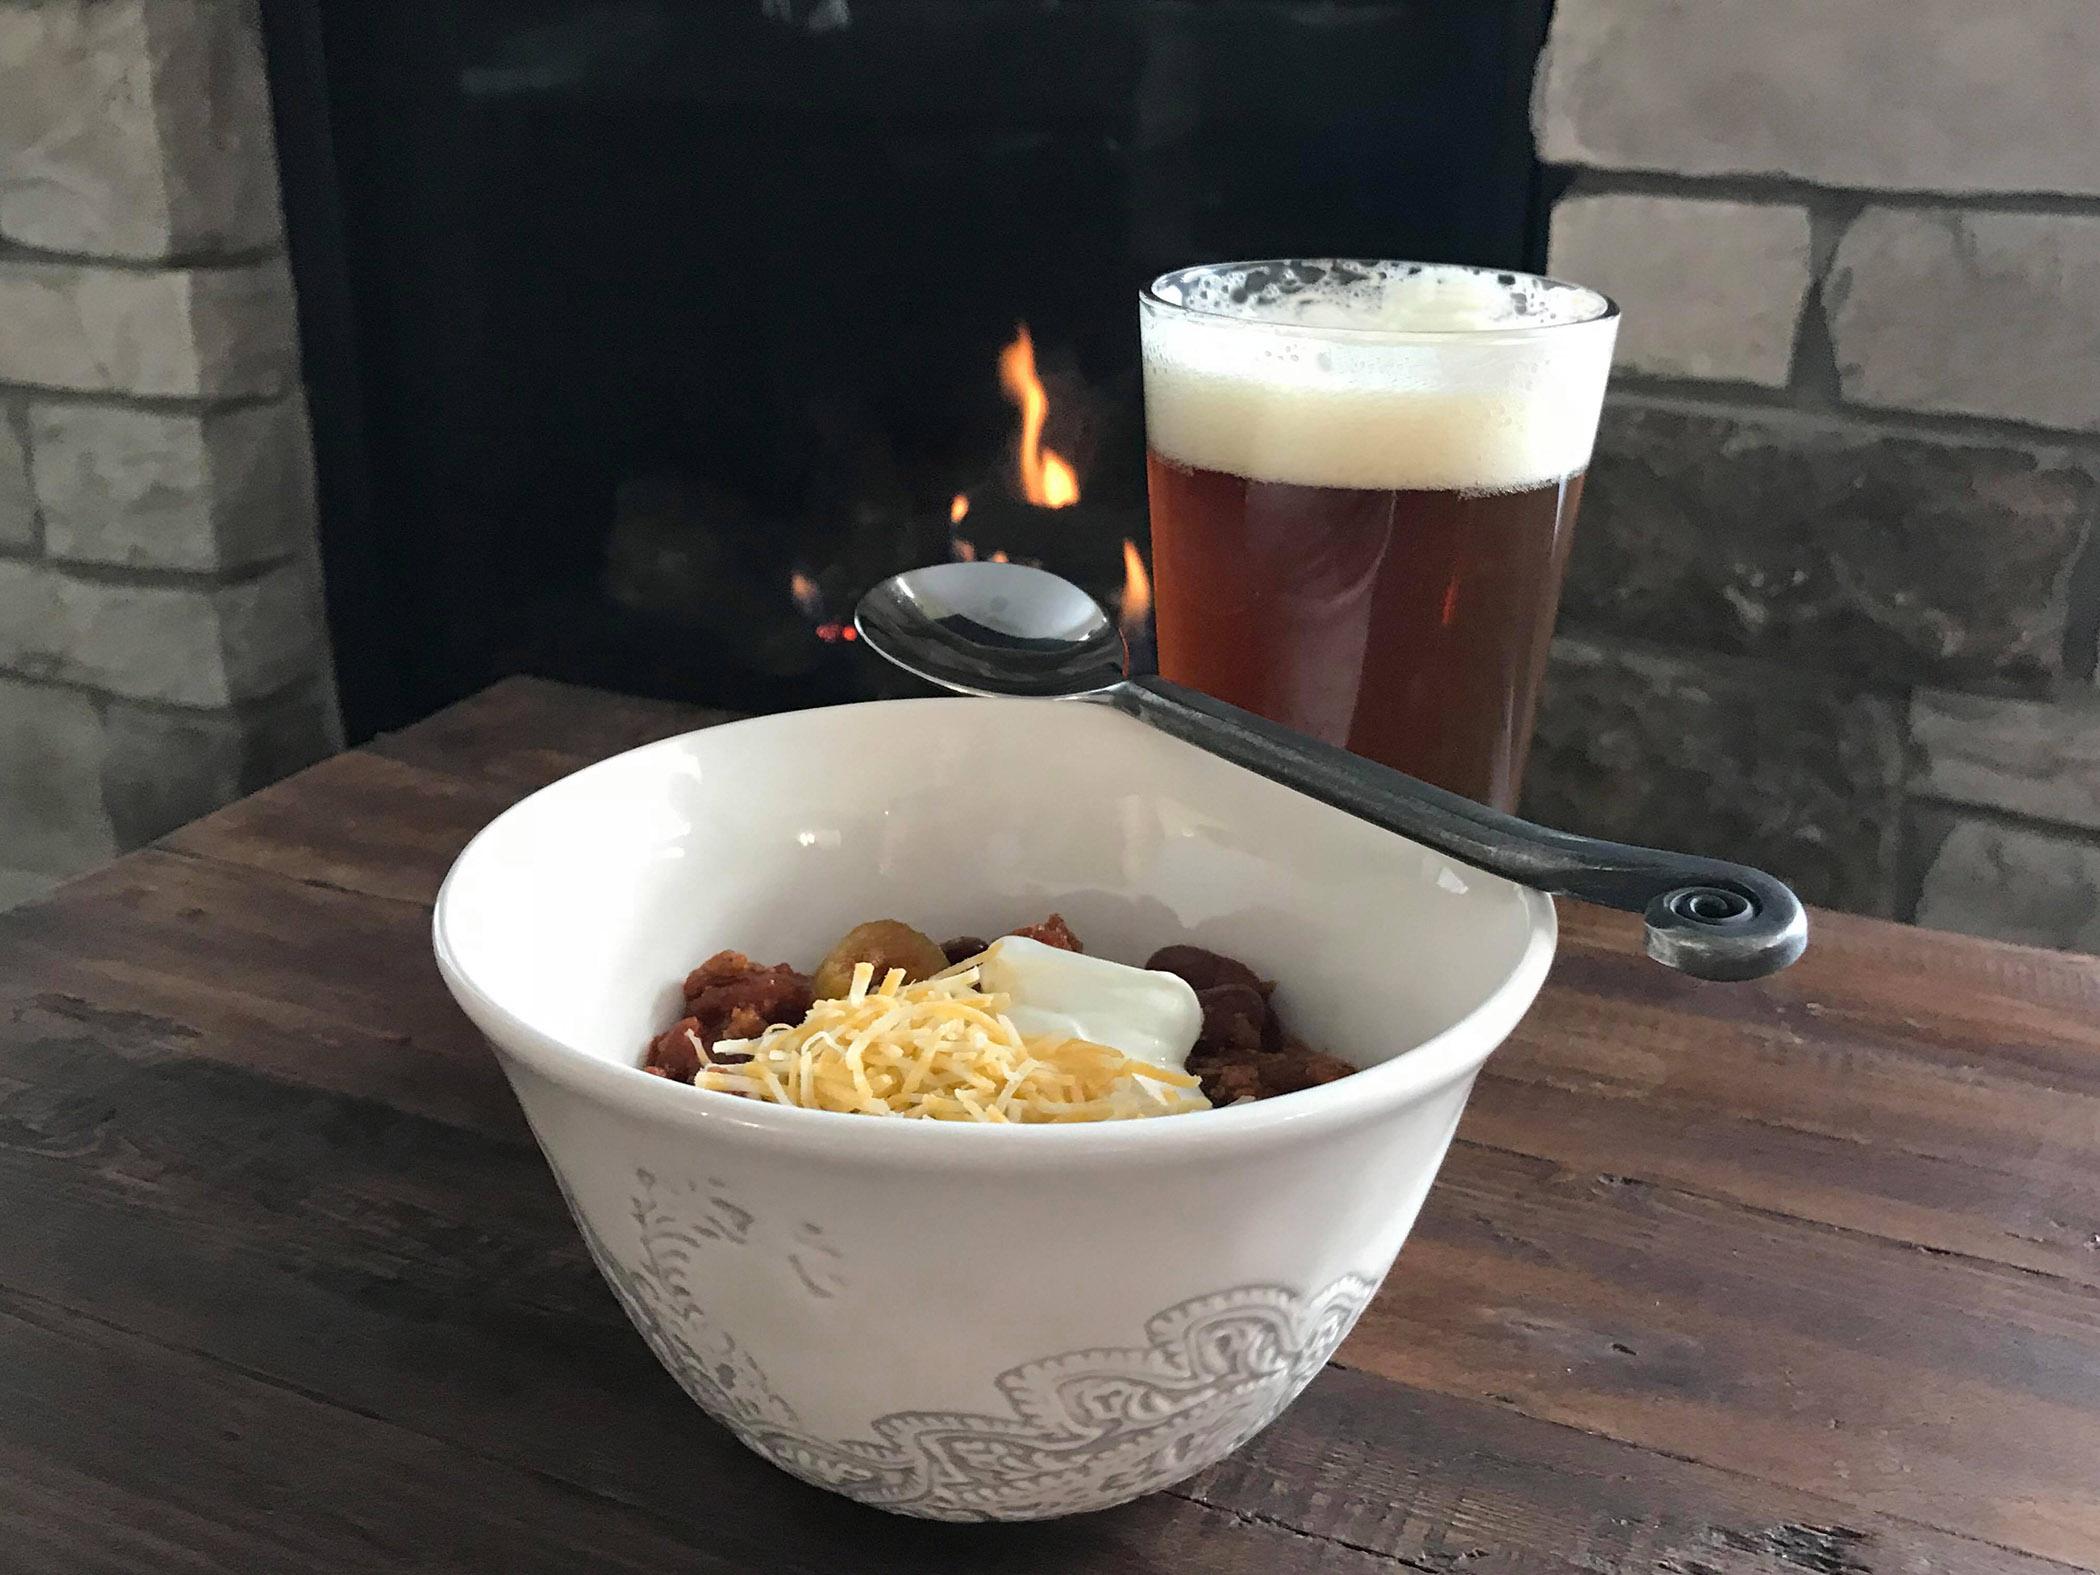 chili, beer